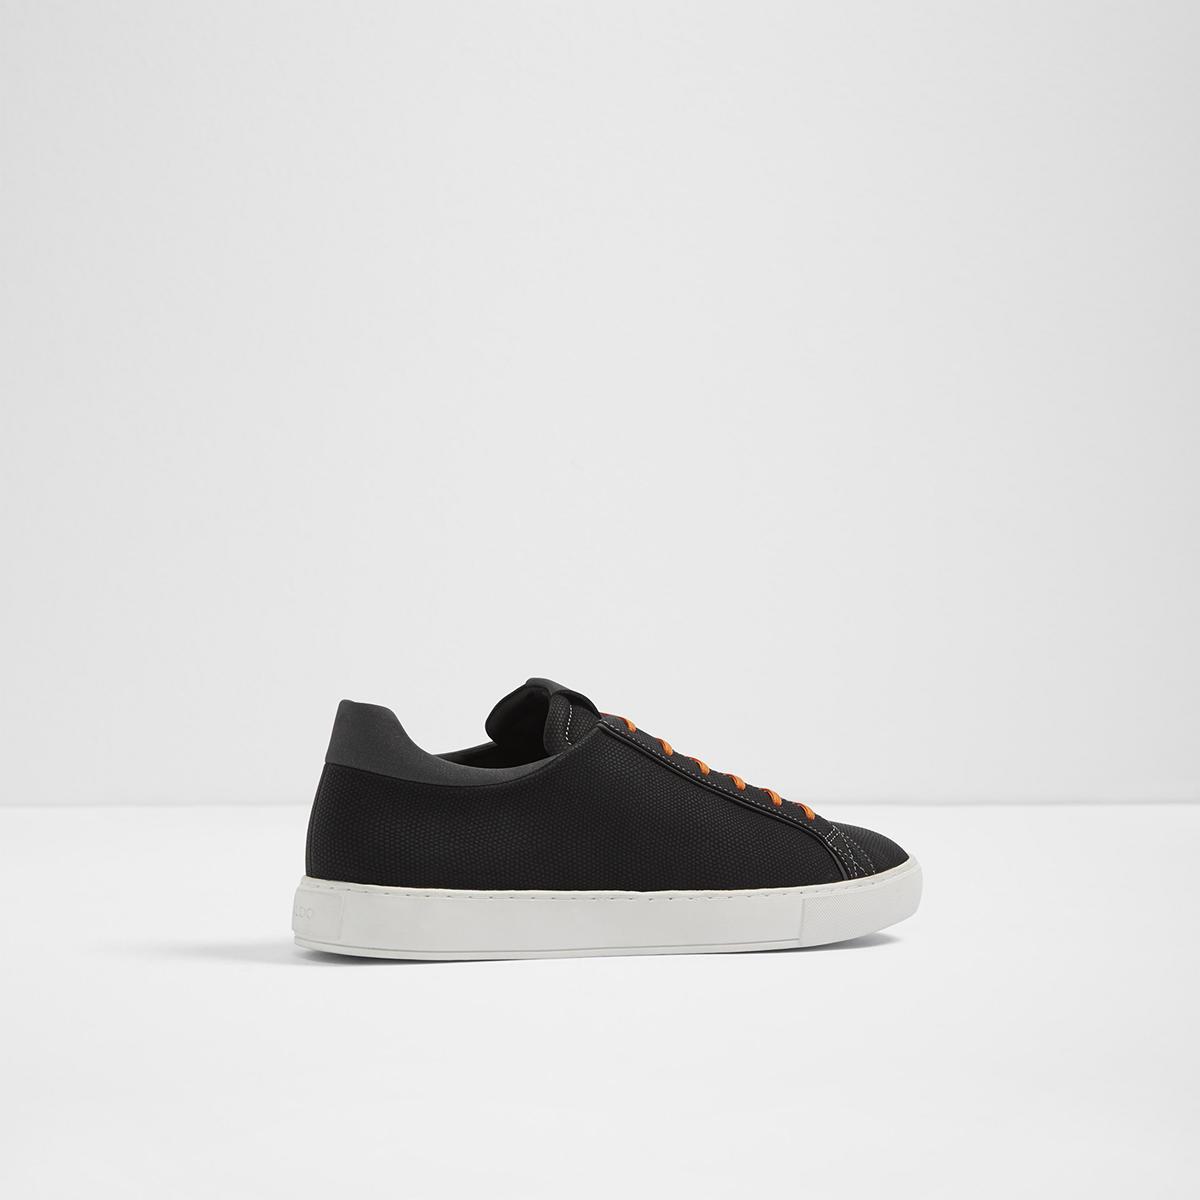 ad7c887ff4db Armanti Black Men s Sneakers